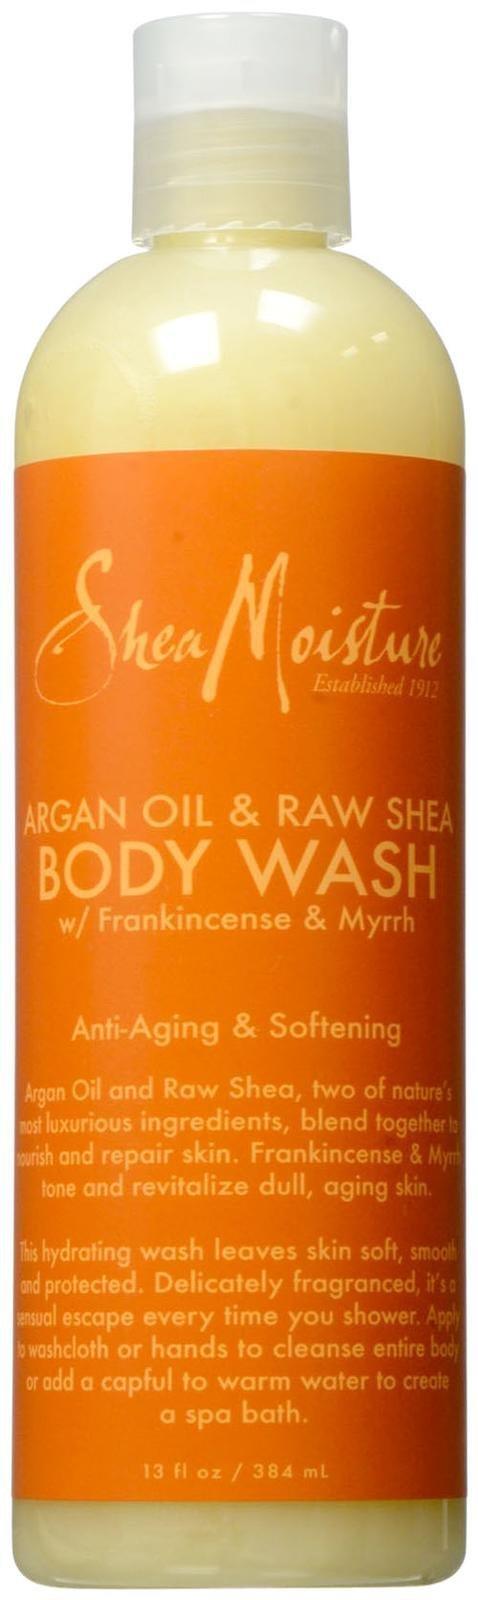 SheaMoisture Argan Oil & Raw Shea Body Wash - 13 oz